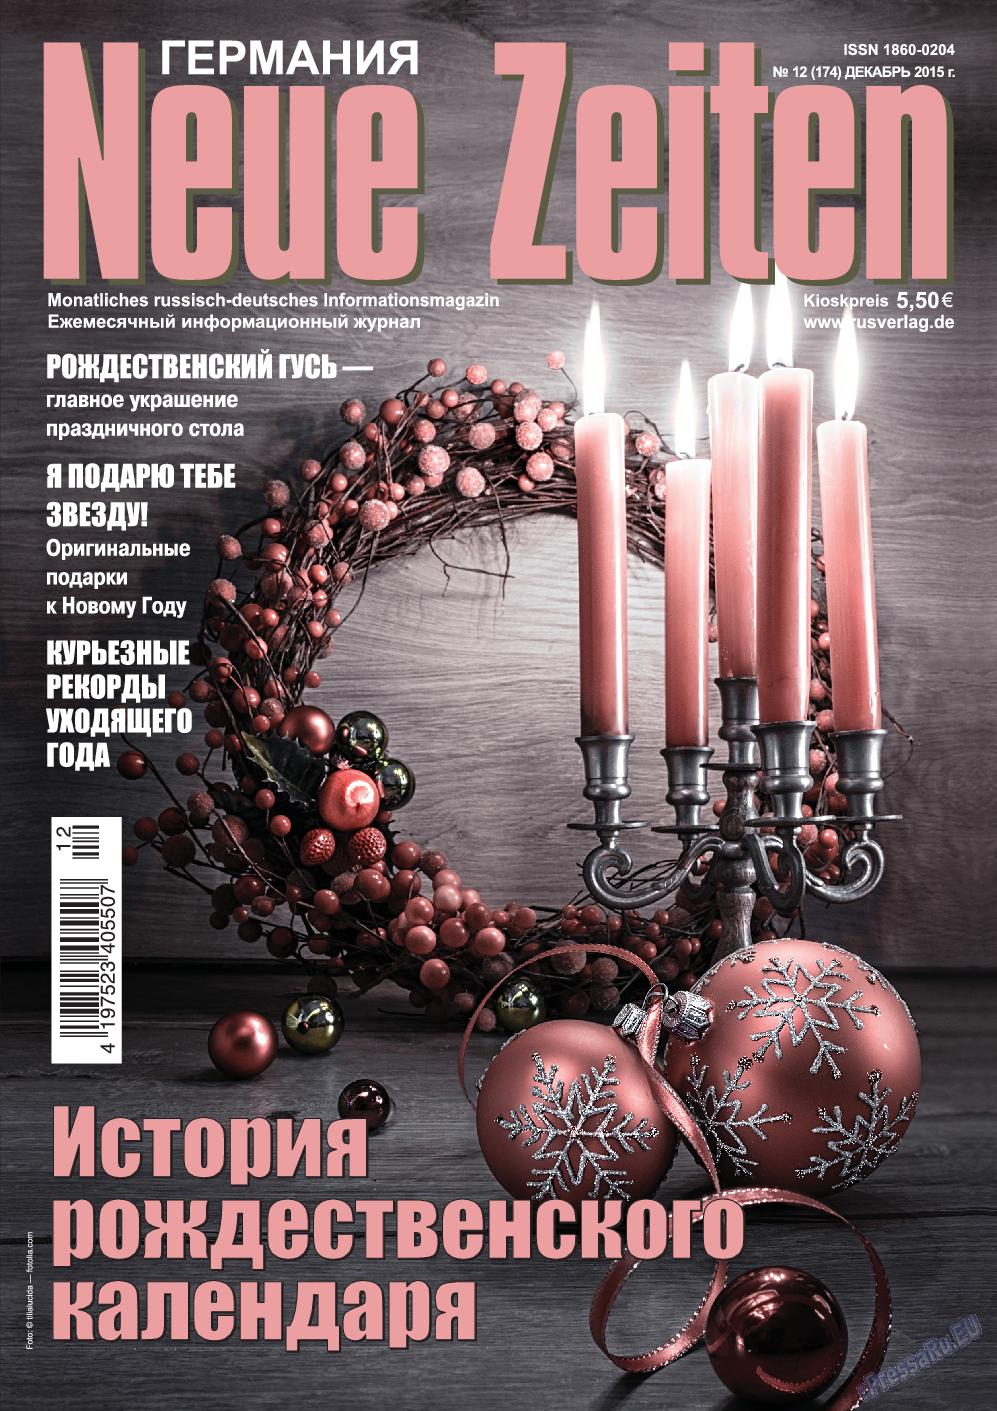 Neue Zeiten (журнал). 2015 год, номер 12, стр. 1